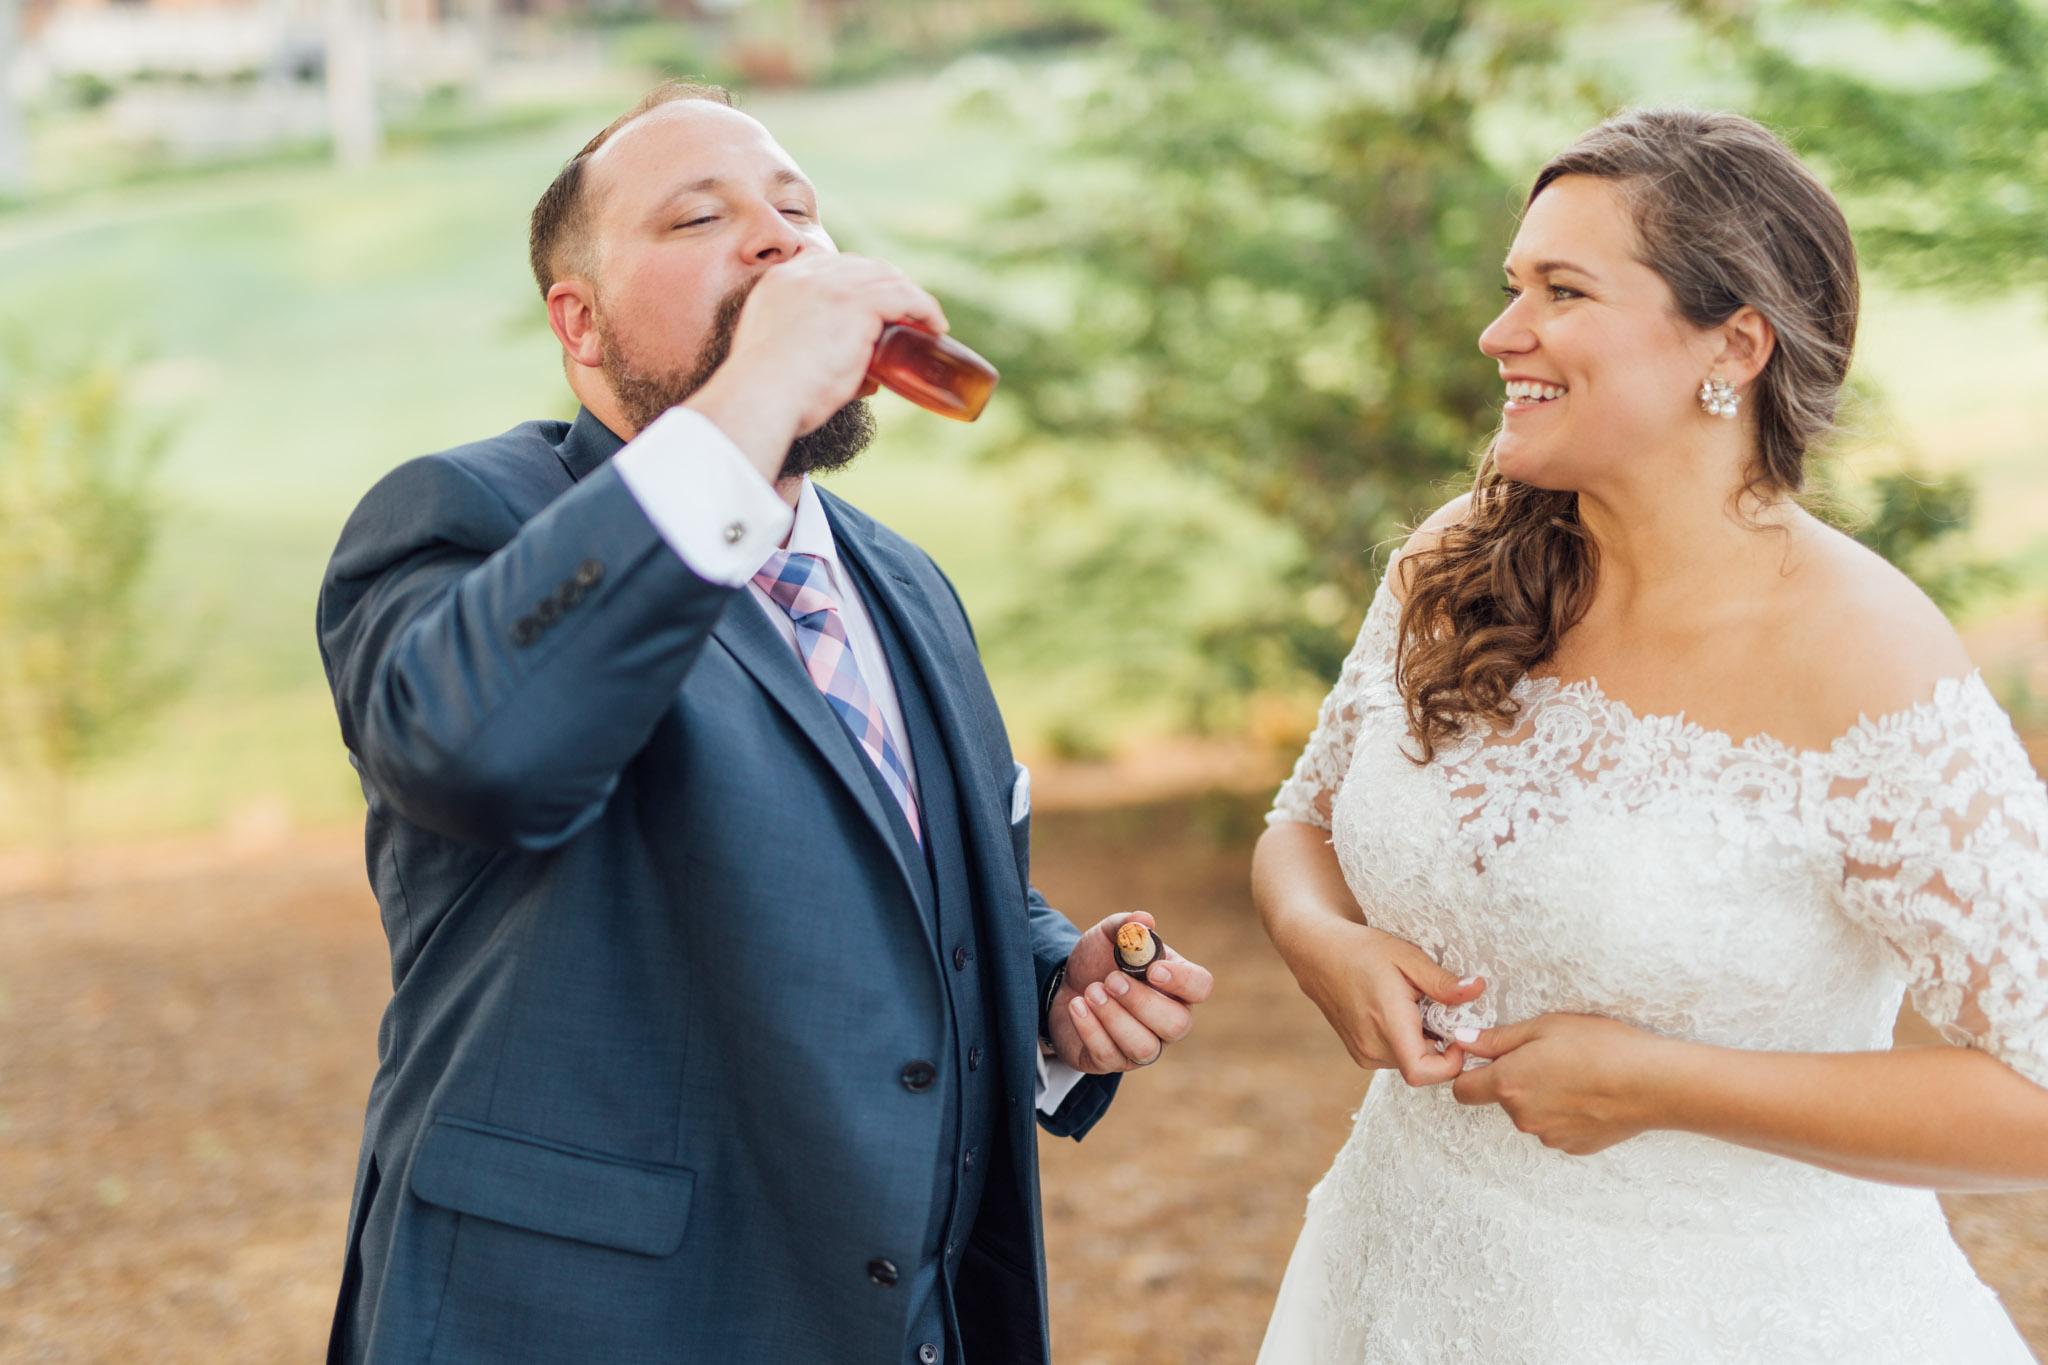 Country Club of Virginia Wedding Photographer_0090.jpg